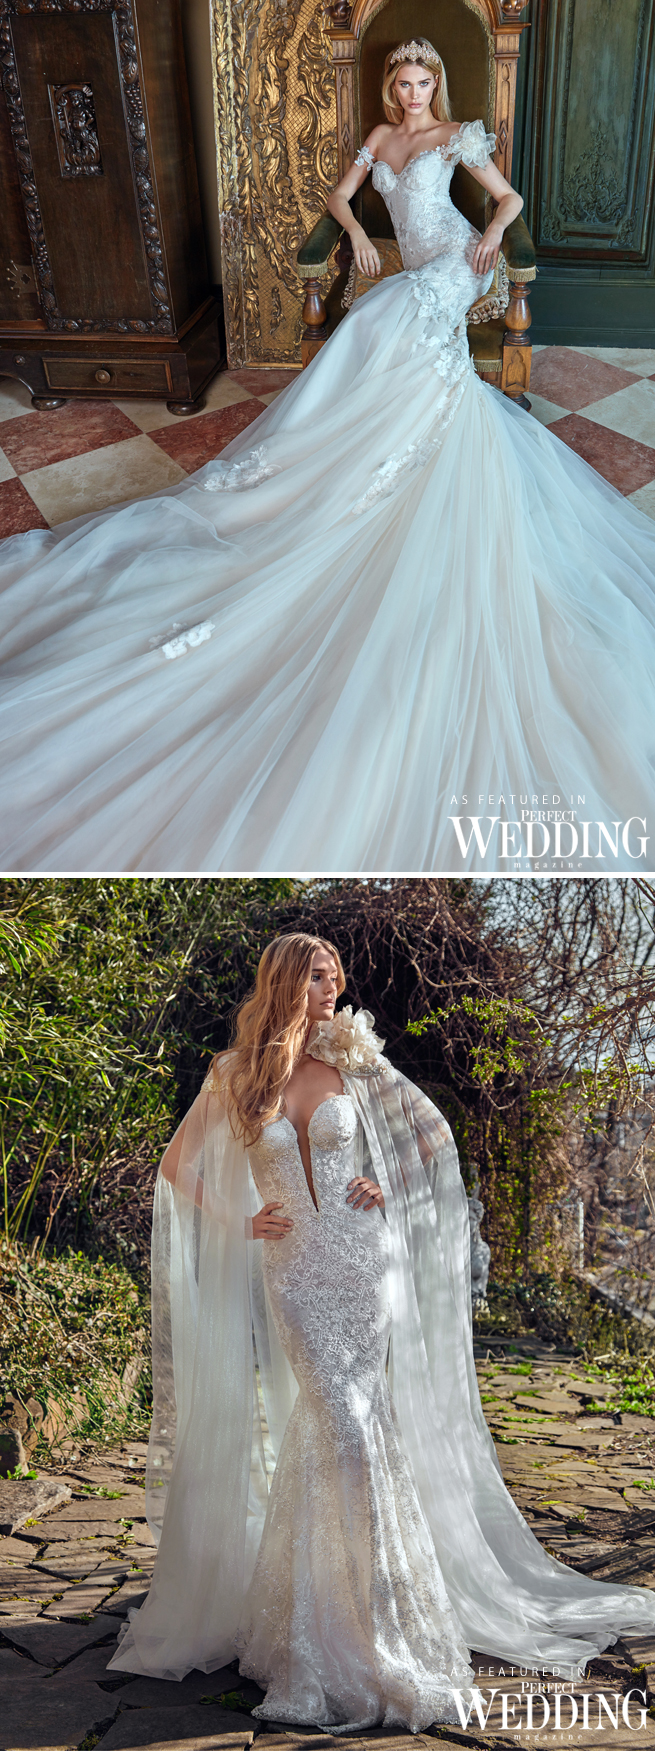 Galia Lahav, Le Secret Royal, Couture Bride, Bridal Gowns, Perfect Wedding Magazine, Perfect Wedding Blog